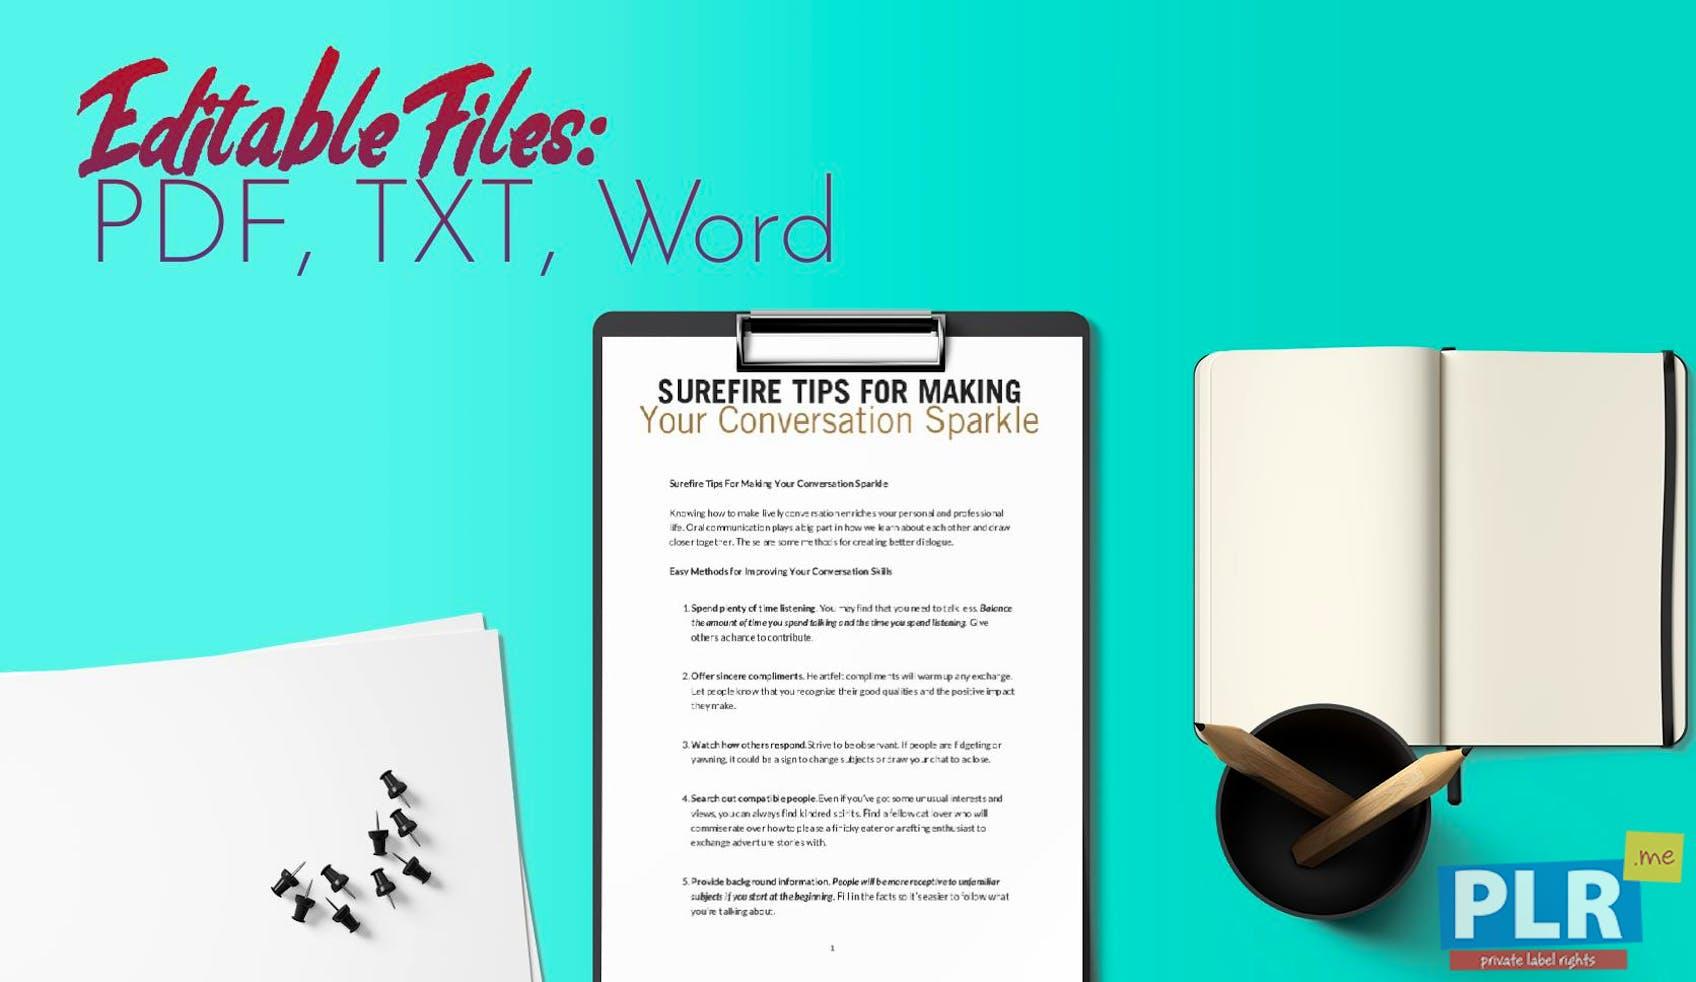 Surefire Tips For Making Your Conversation Sparkle